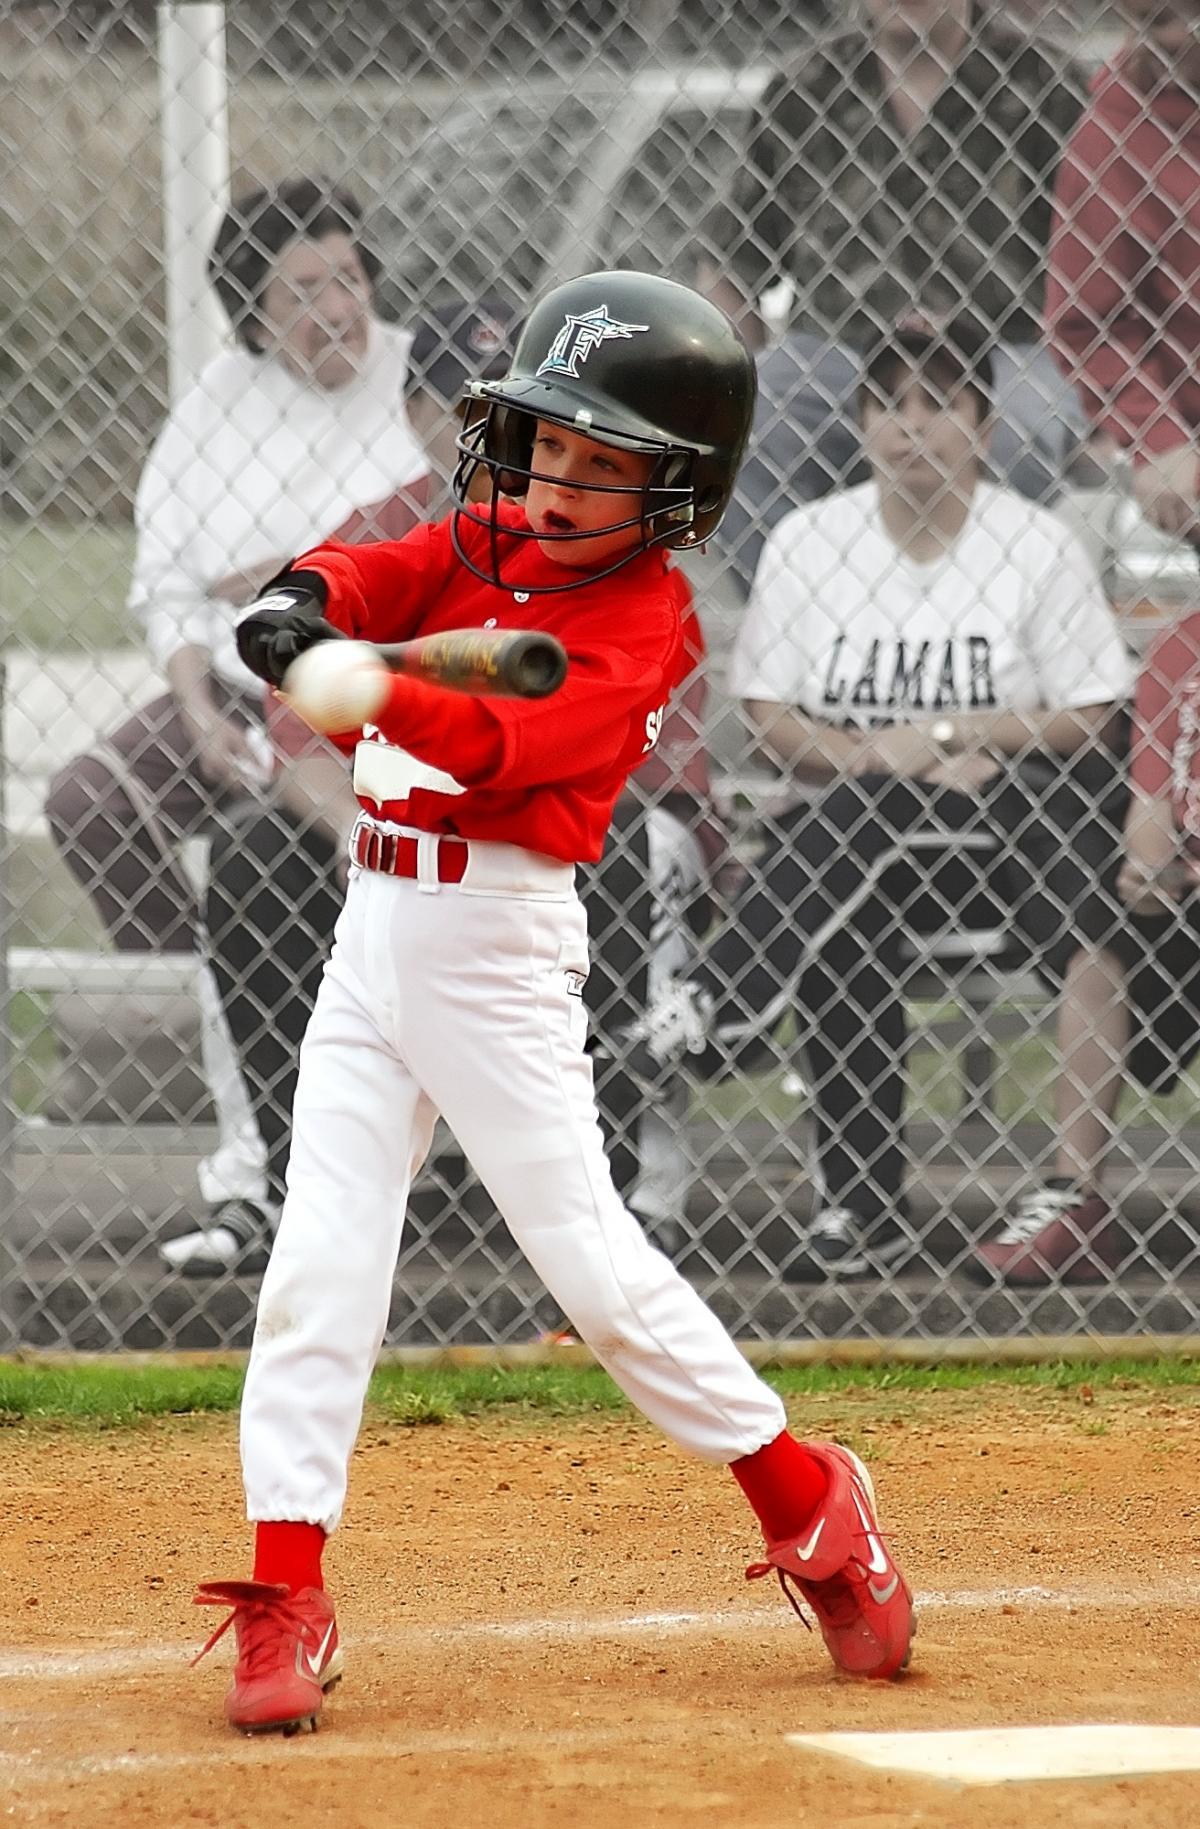 Action athlete athletic ballpark